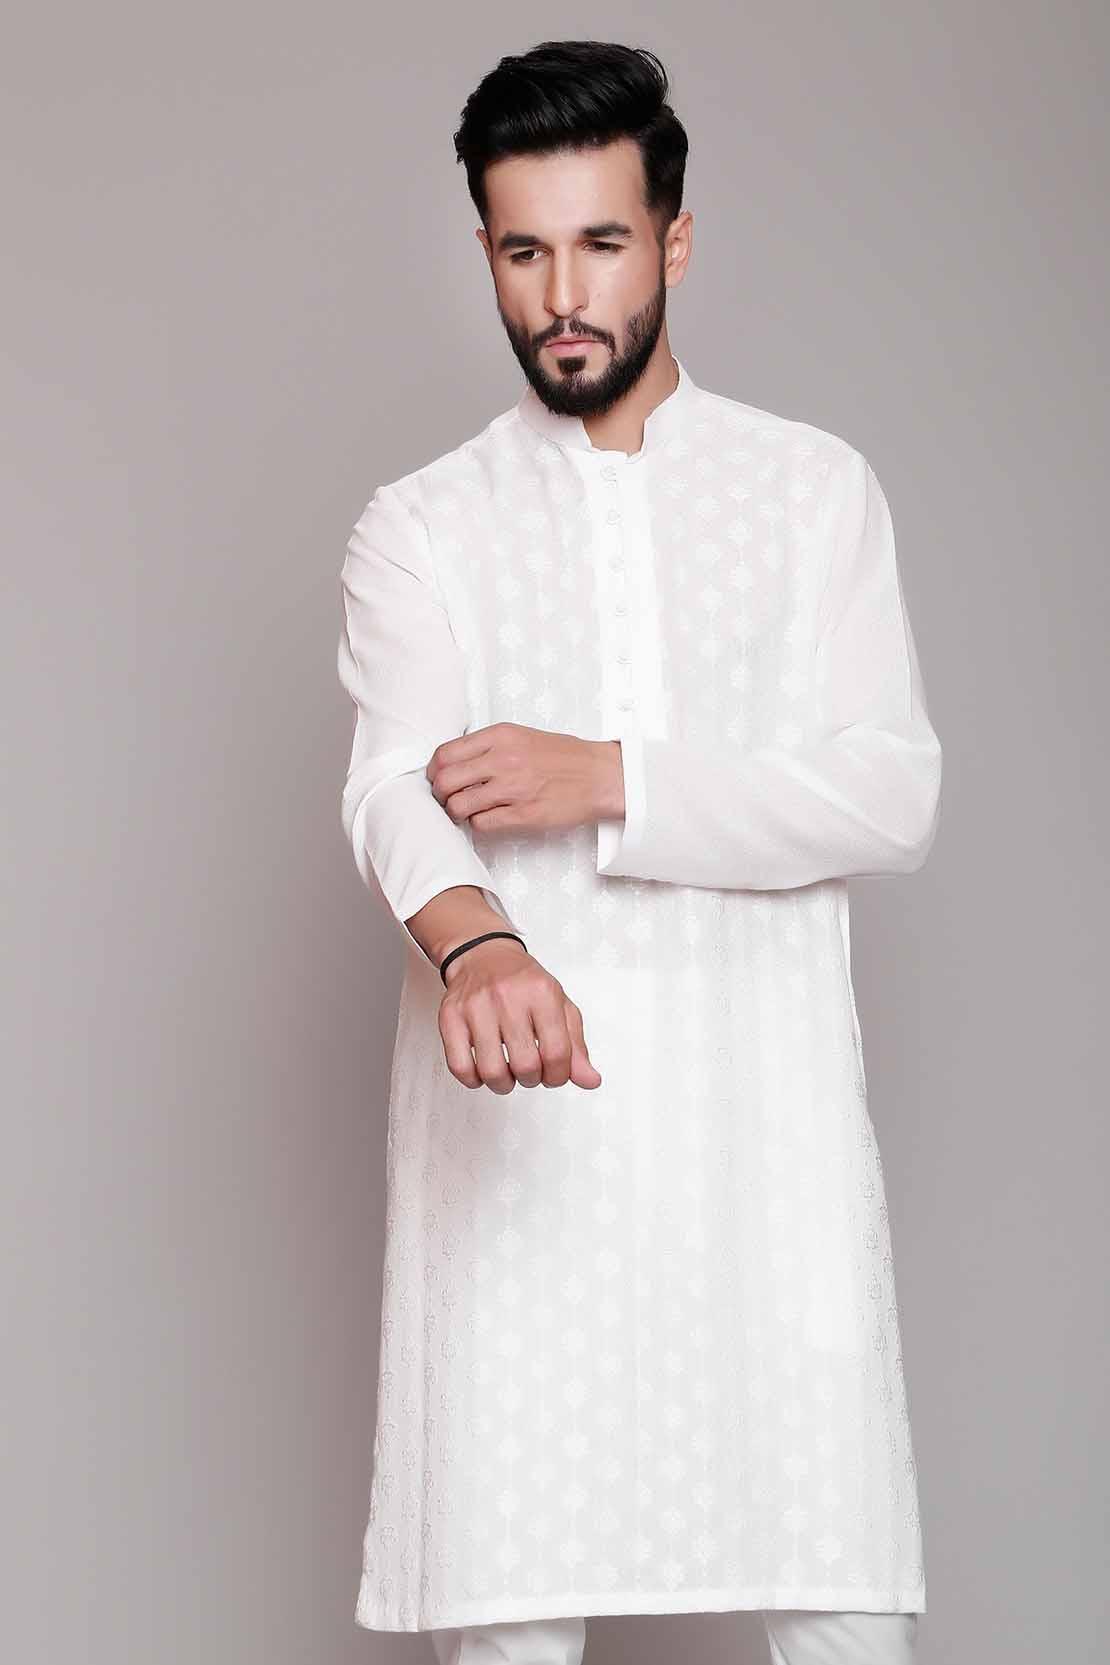 Wholesale Mens Salwar Kameez And Kurtas Collection 2018 |White Salwar Kameez Designs For Men